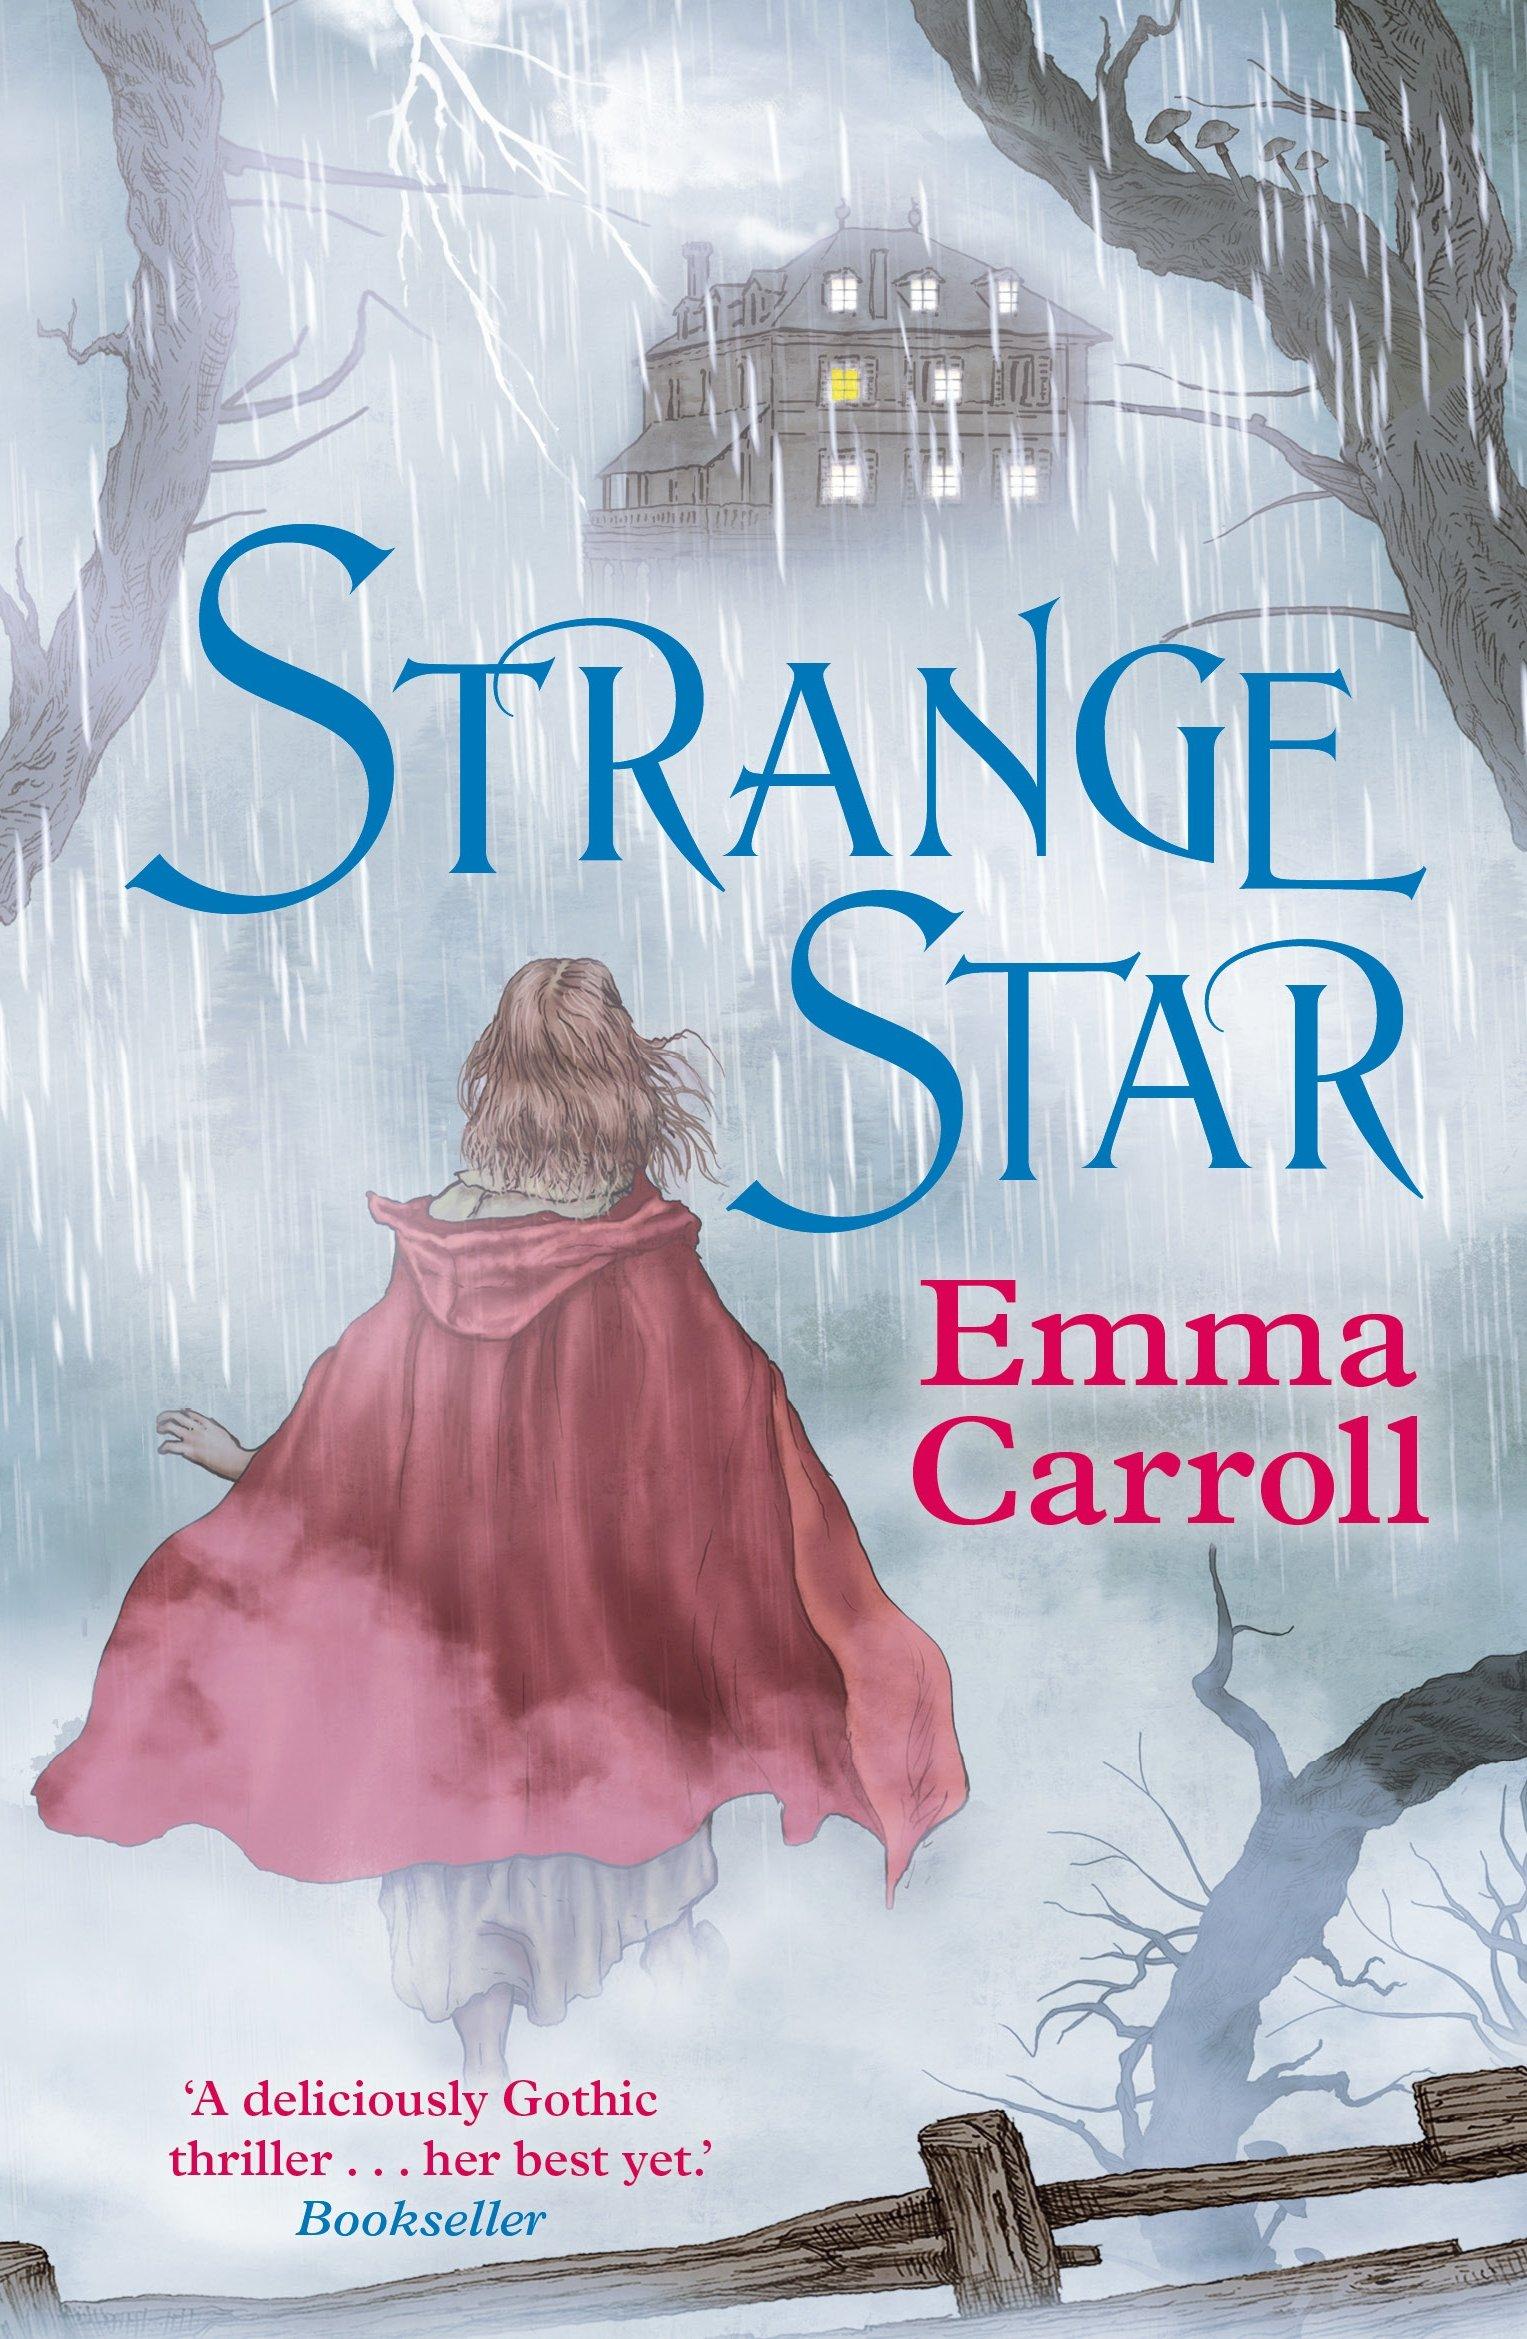 Strange Star: Amazon.co.uk: Carroll, Emma: 9780571317653: Books